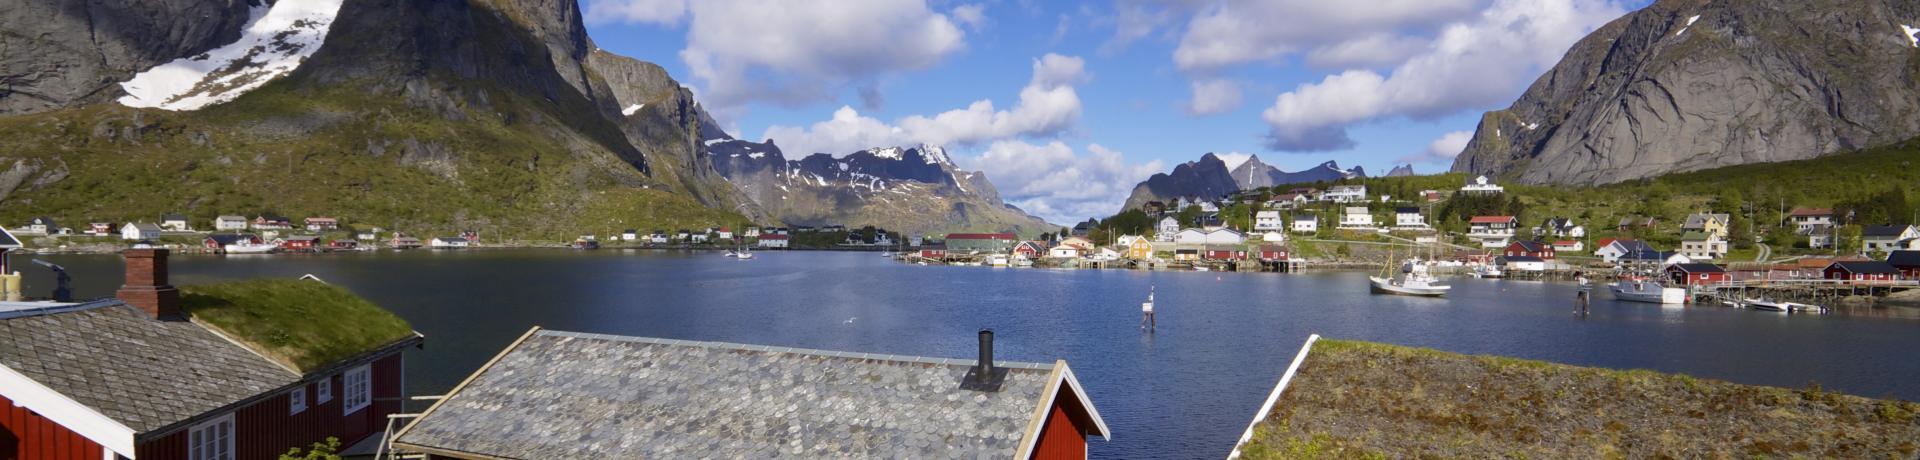 171+Norwegen+TS_166681371.jpg